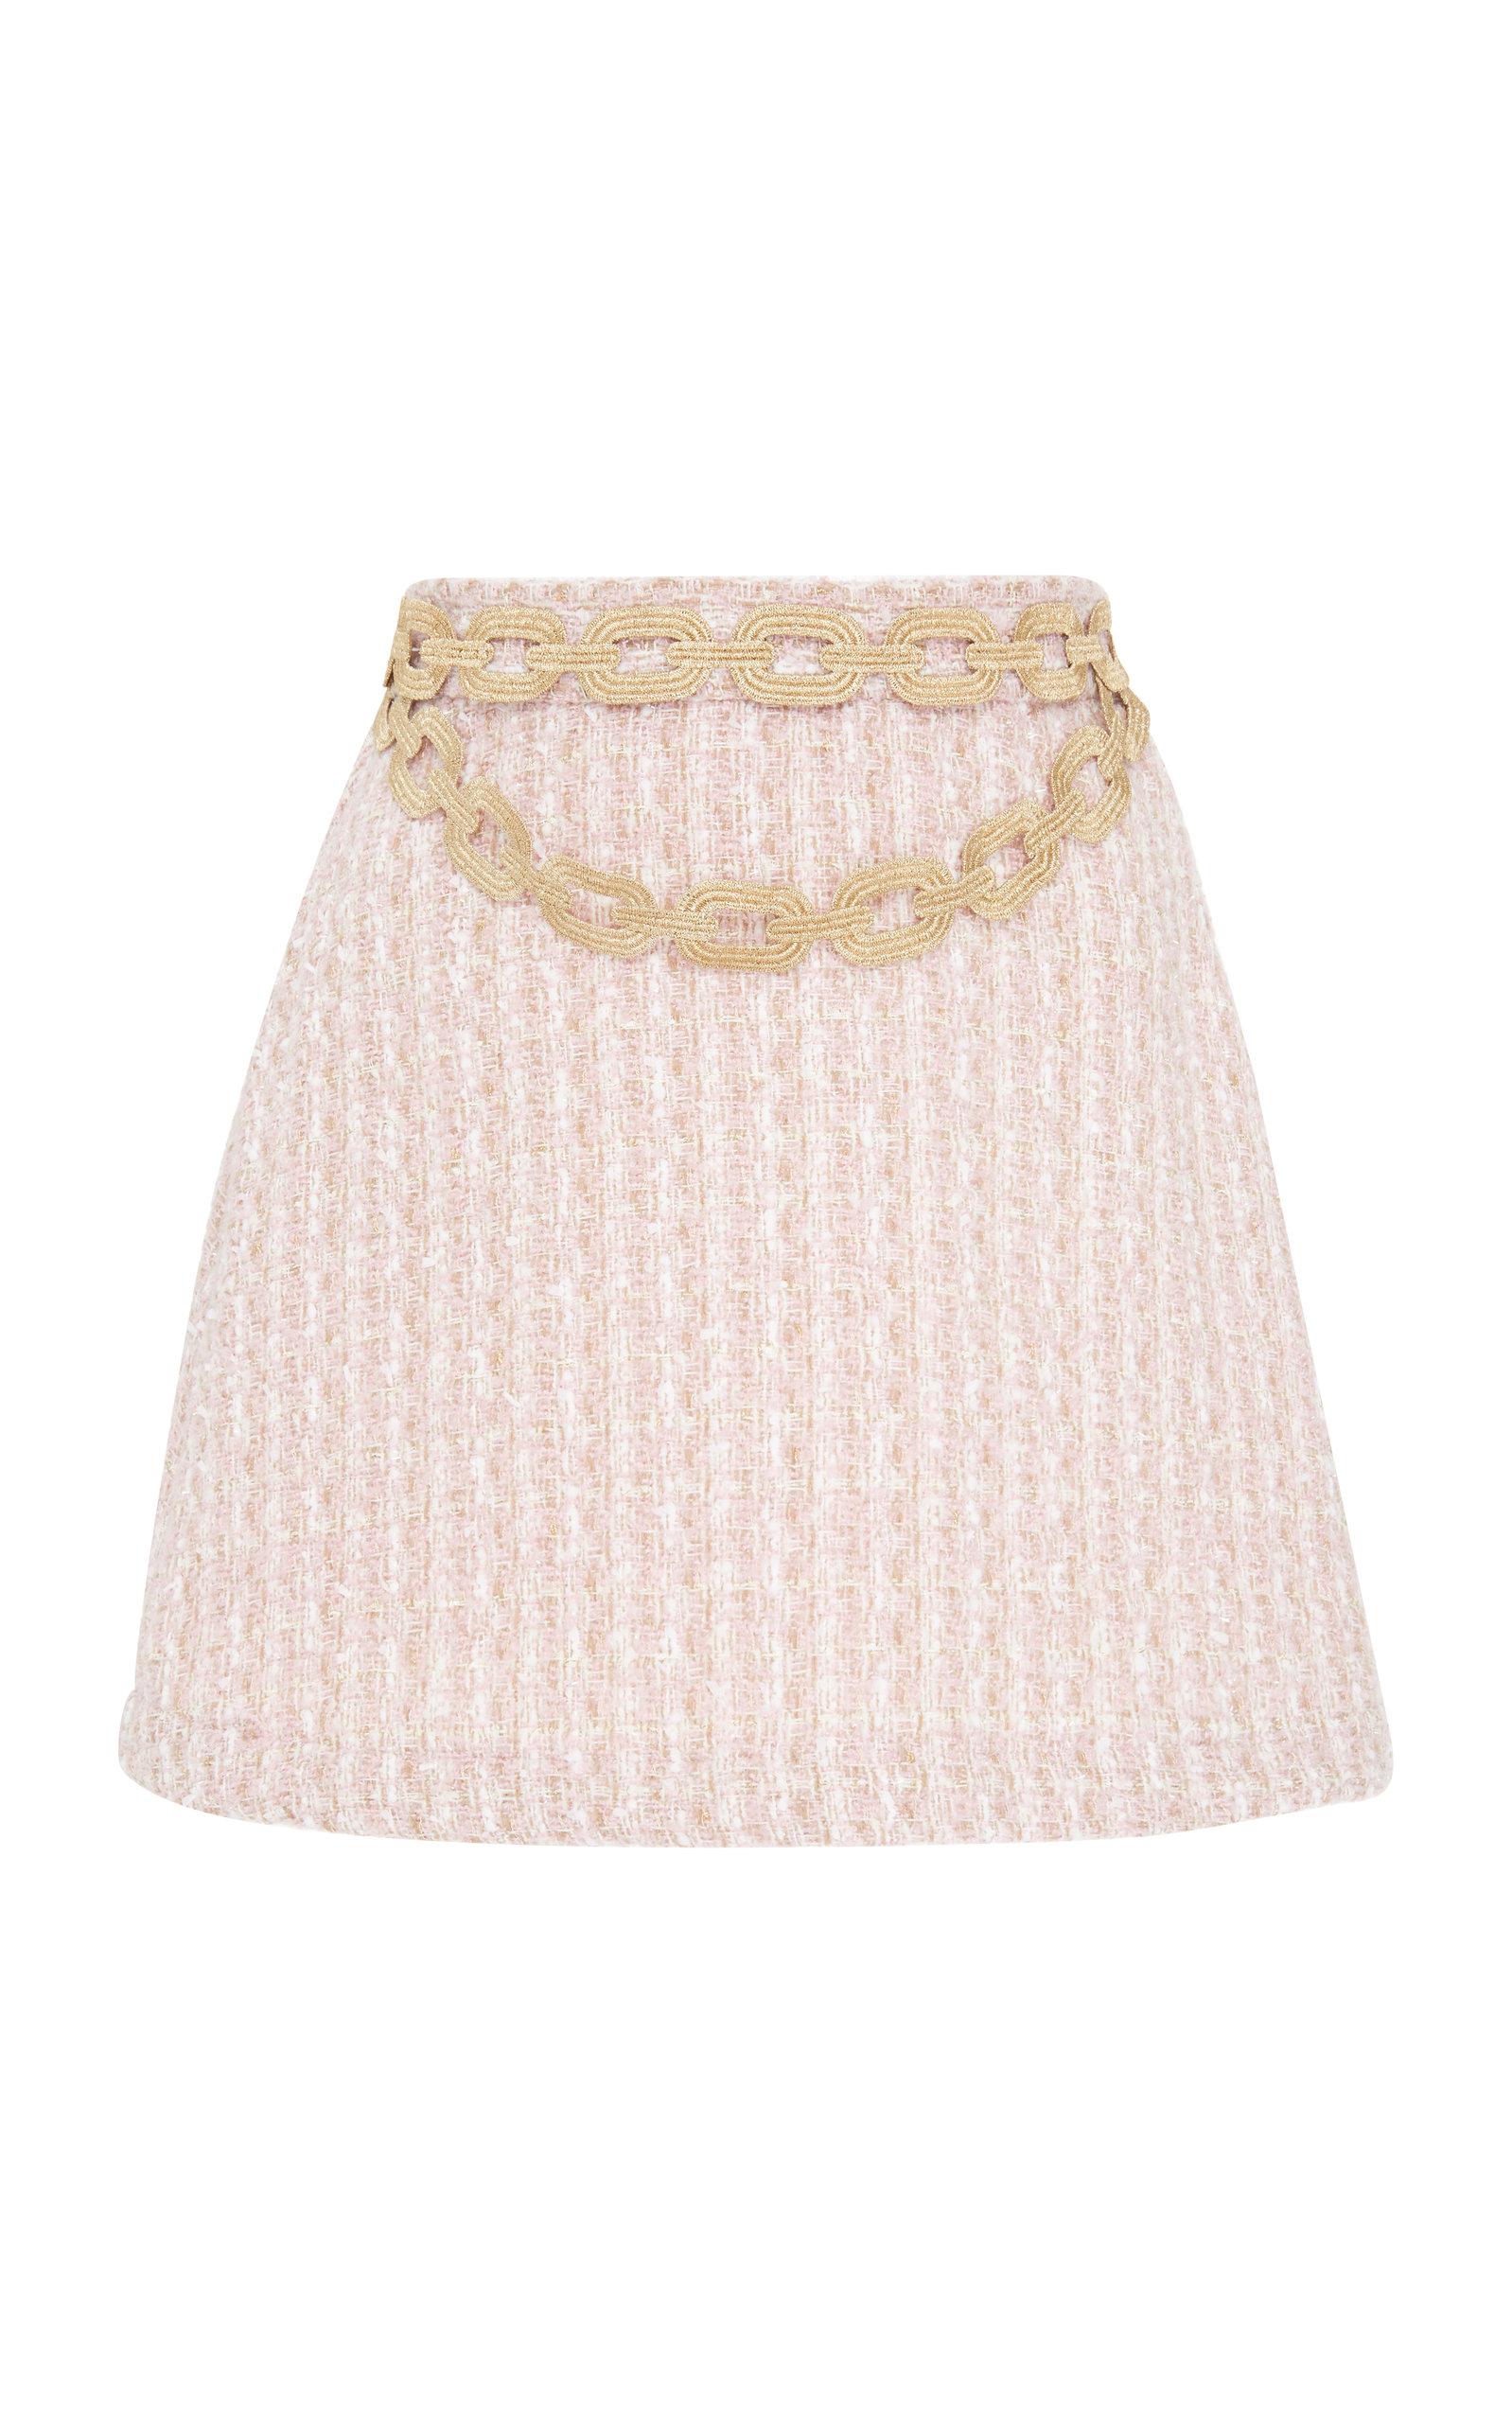 ALCOOLIQUE Gabry Mini Skirt in Pink